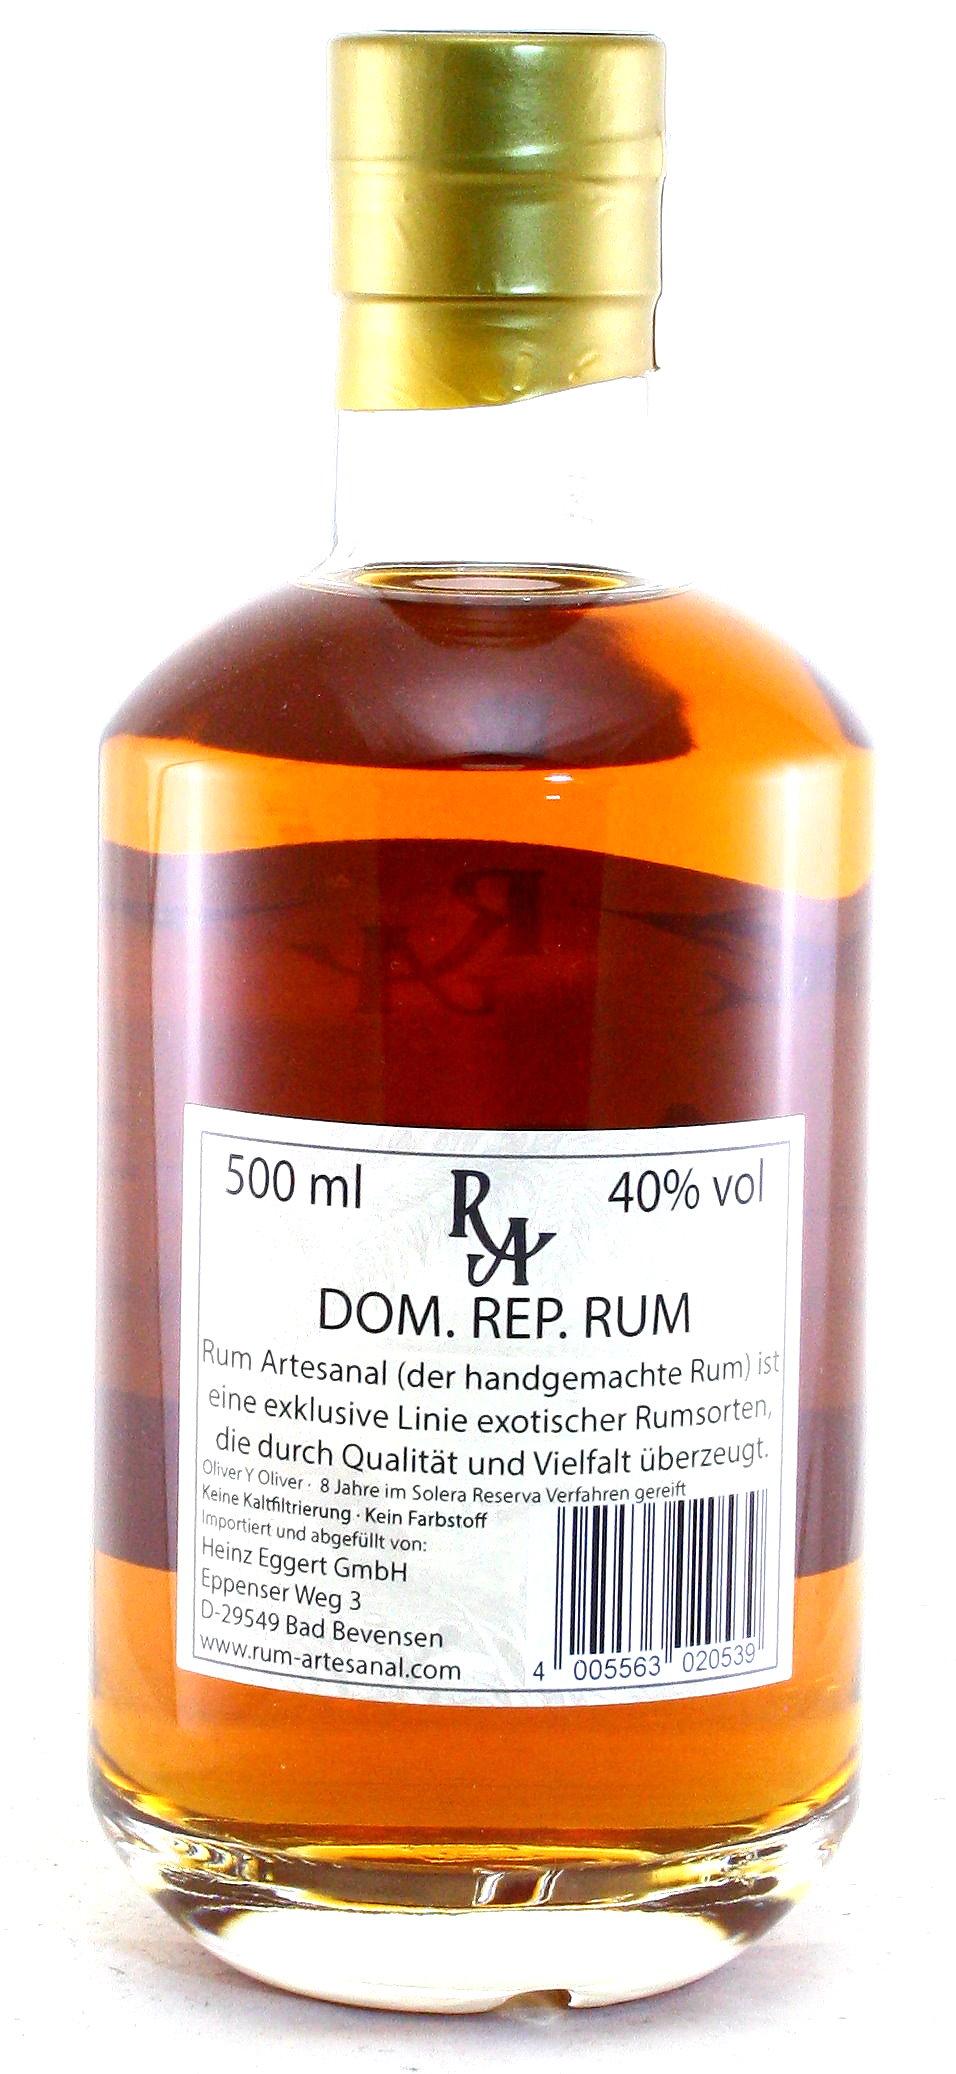 500 ml Ron de Republica Dominicana, Rum Artesanal Dom. Rep.